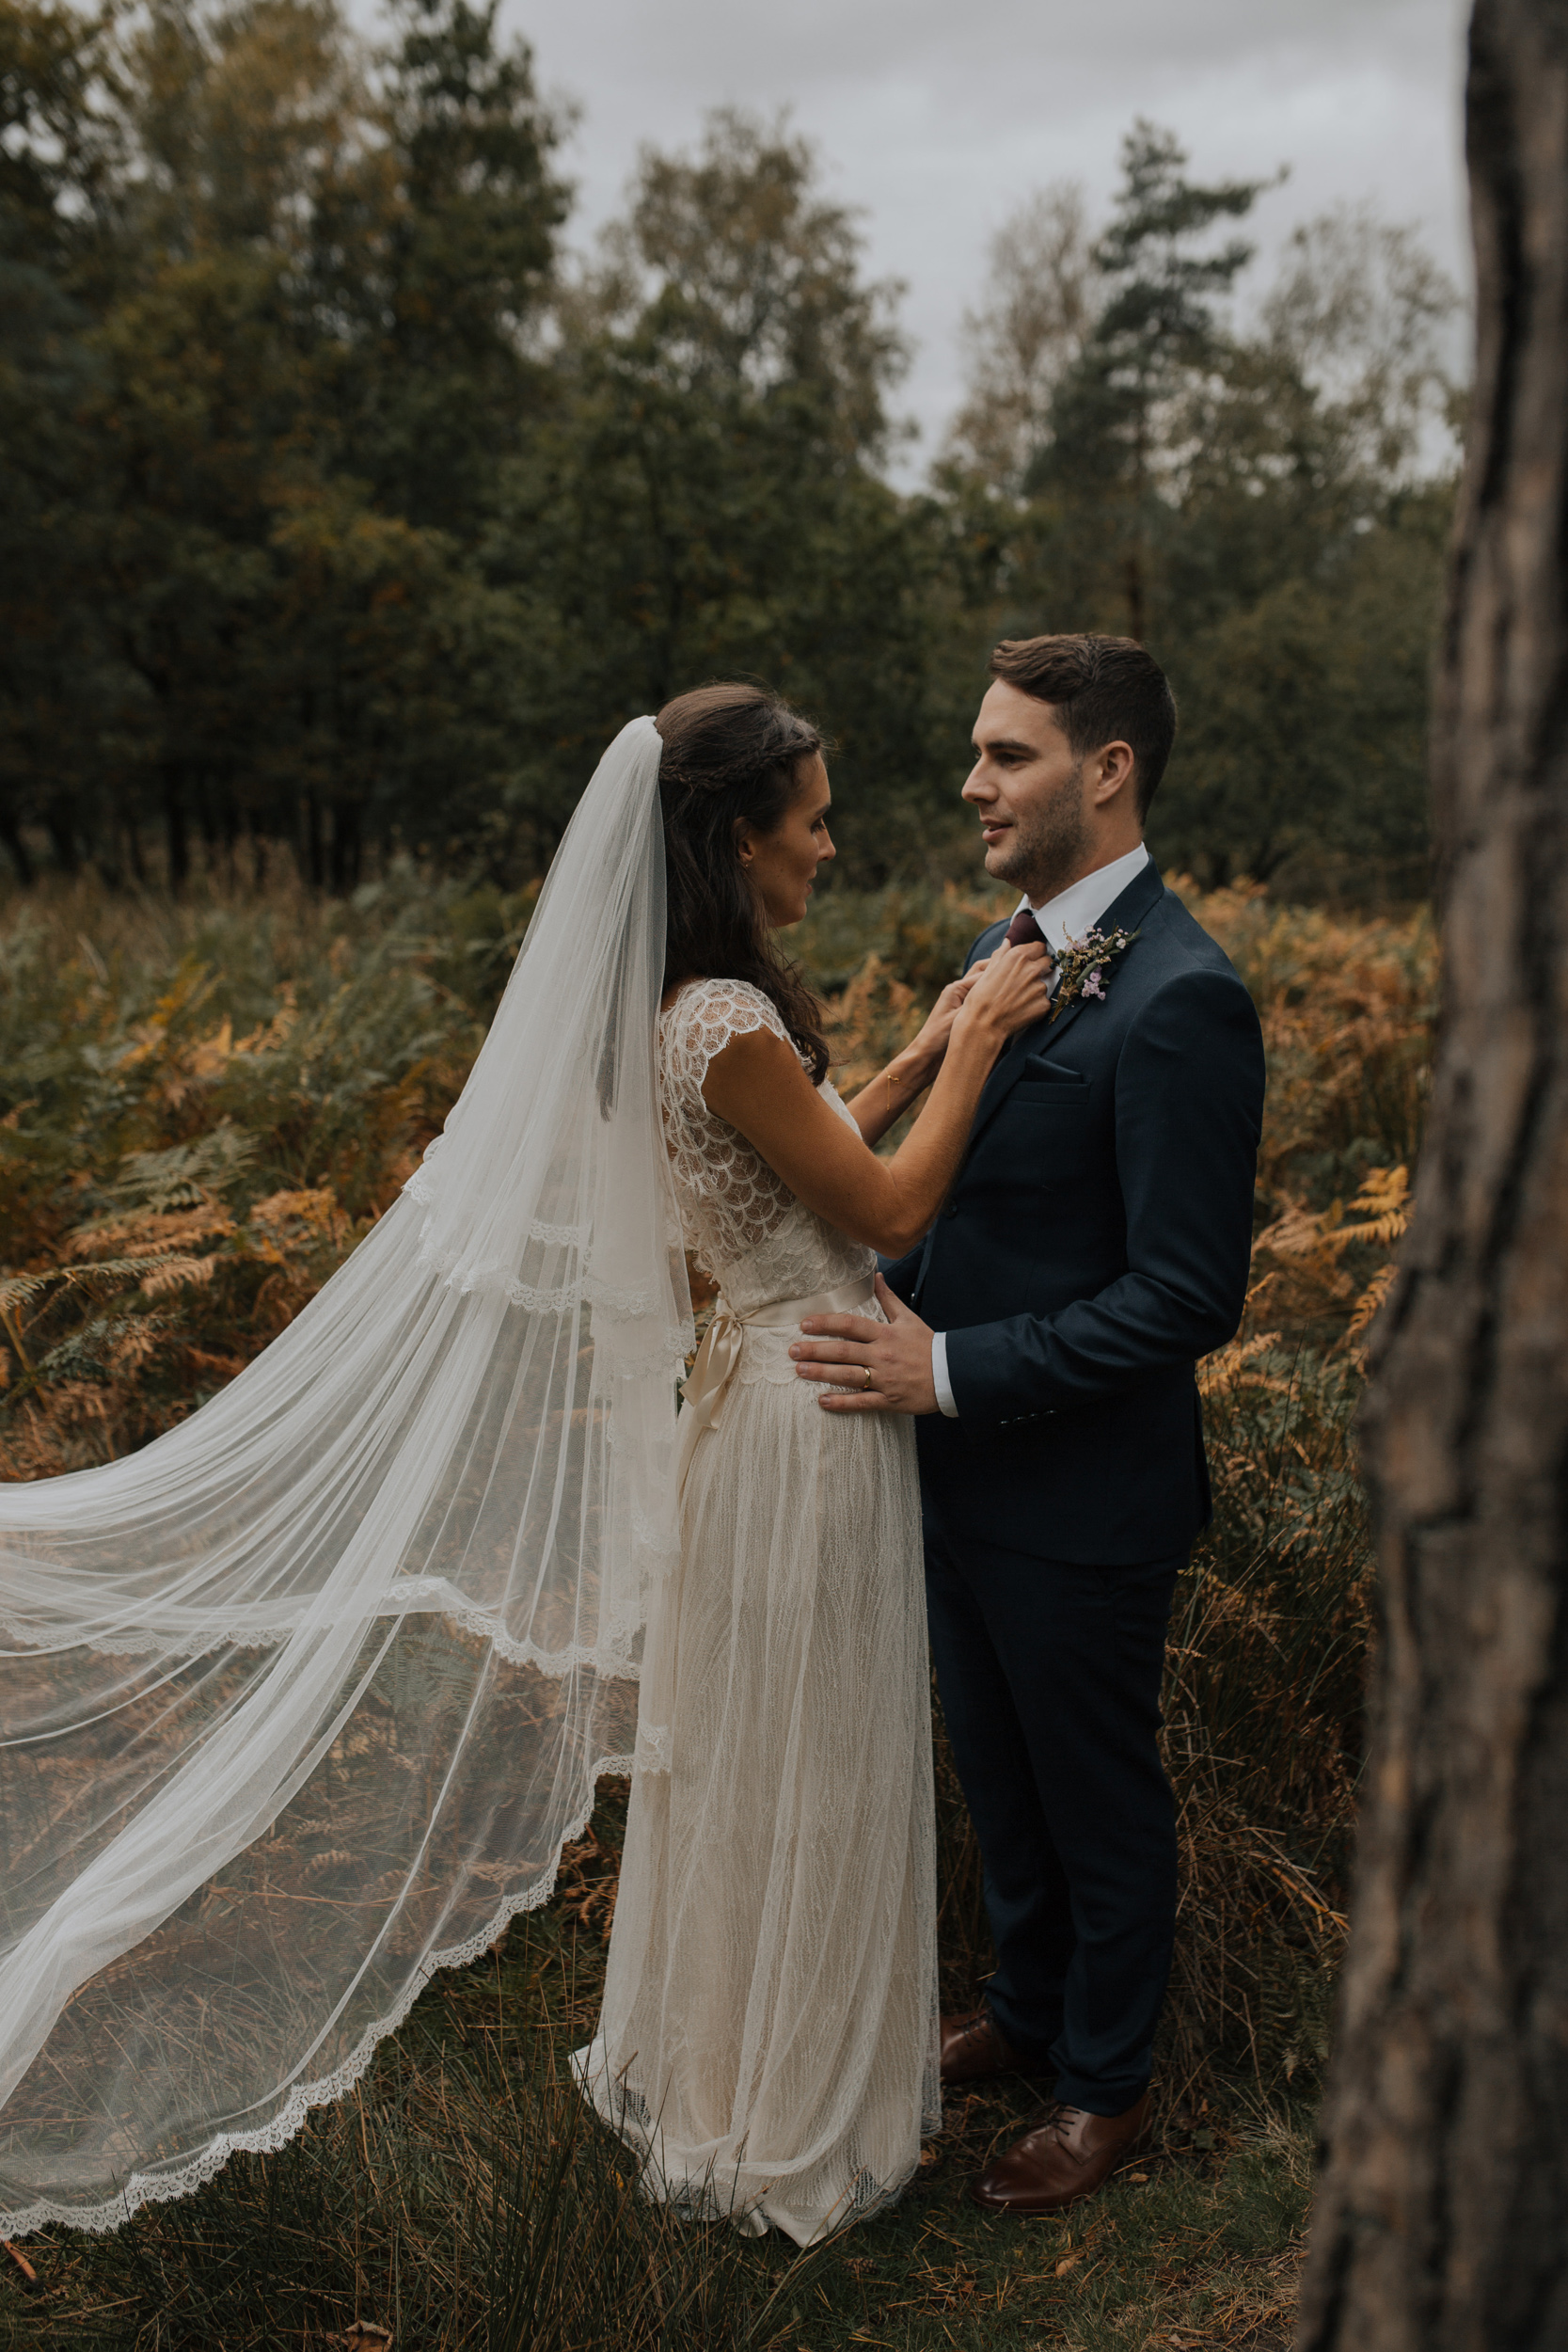 Joasia-Kate-Beaumont-Bohemian-Lace-Wedding-Dress-Peak-District-Sheffield-Wedding-33.jpg